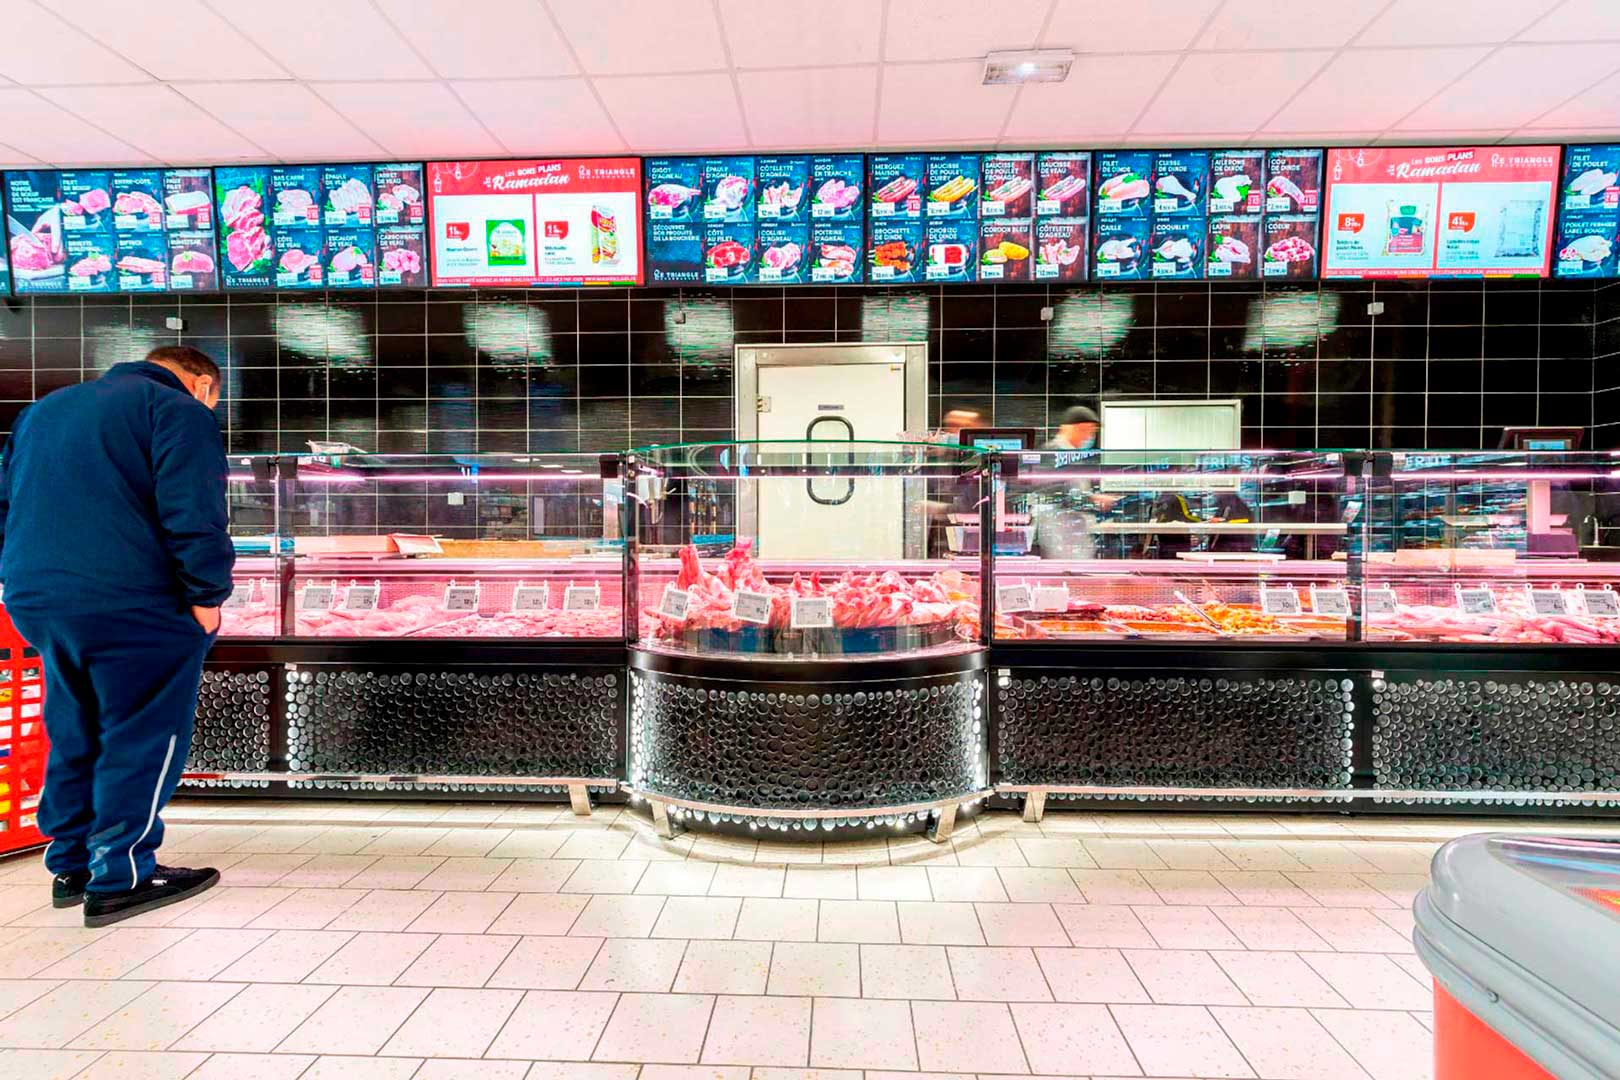 Refrigerated counters Missouri MC 120 M, minimarket LE TRIANGLE in France